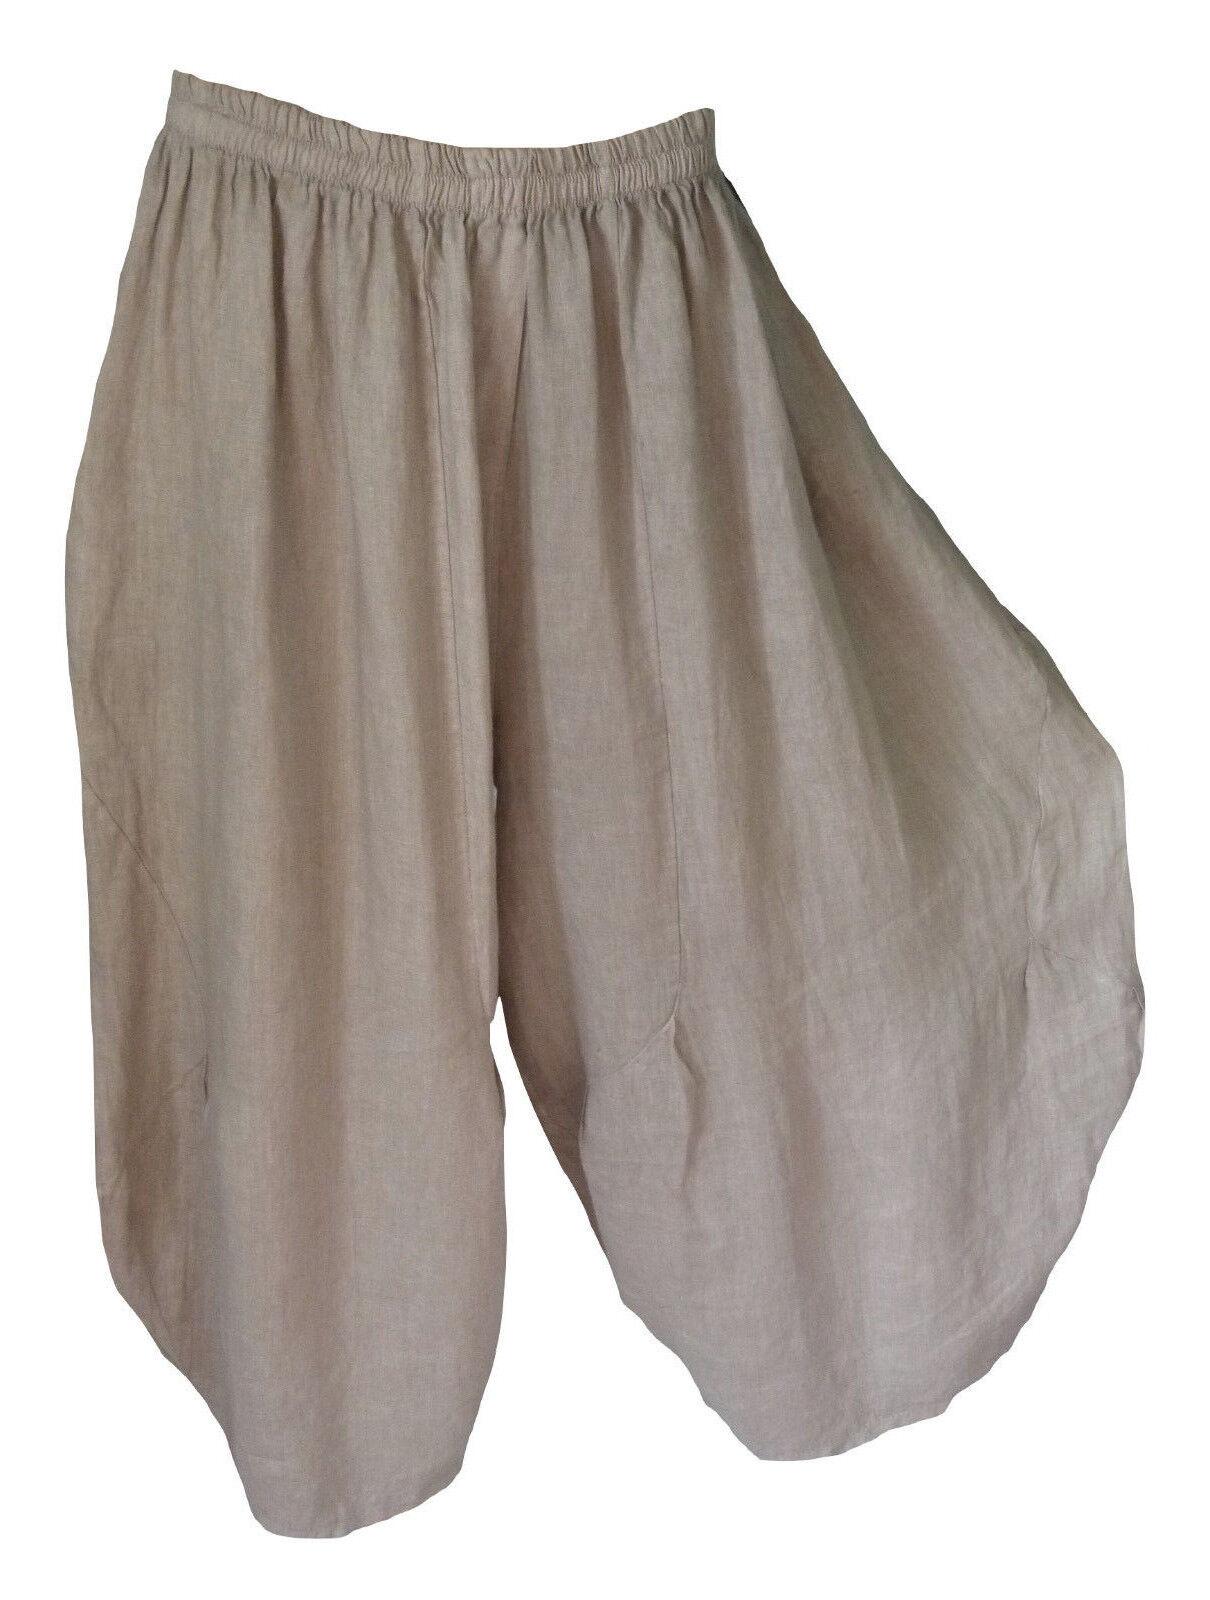 TG 46 48 50 50 50 52 54 56 Puro Lino Pantaloni Lino Pantaloni palloncino Pantaloni Mega lontano Lagenlook 88b960